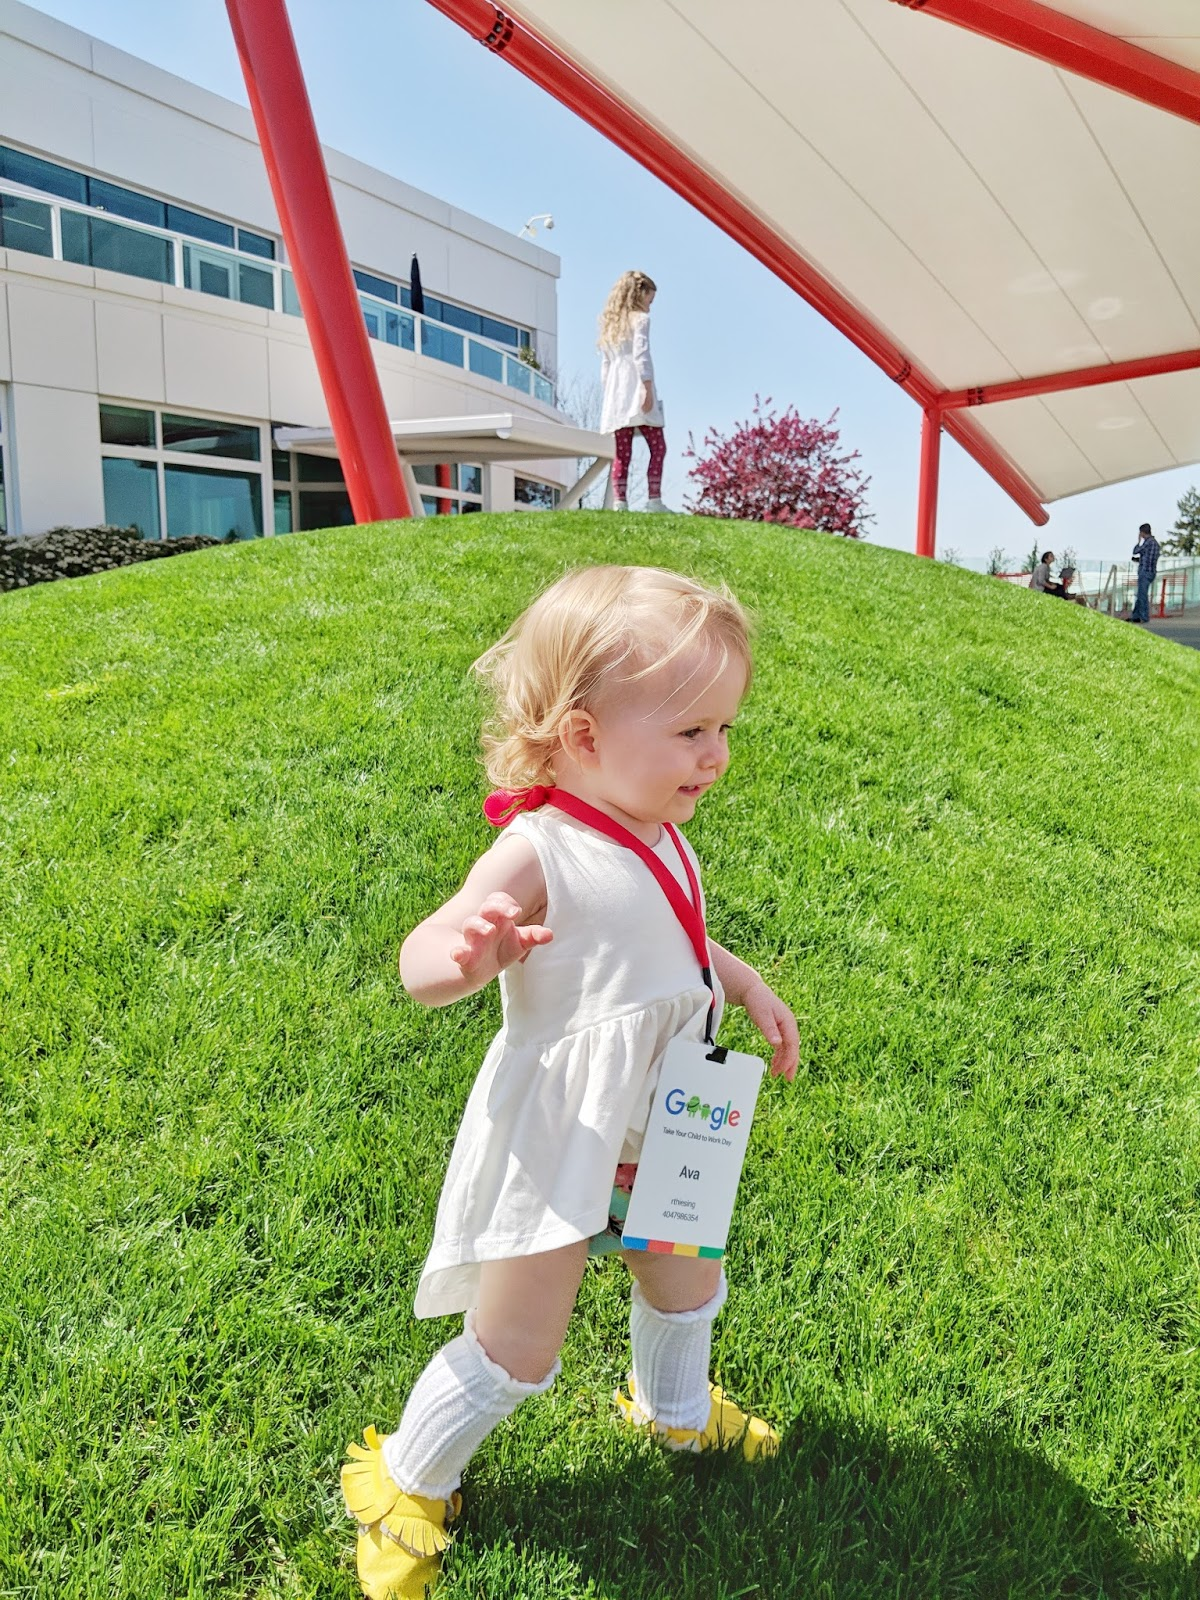 1 year old running in grass future leader googler google baby